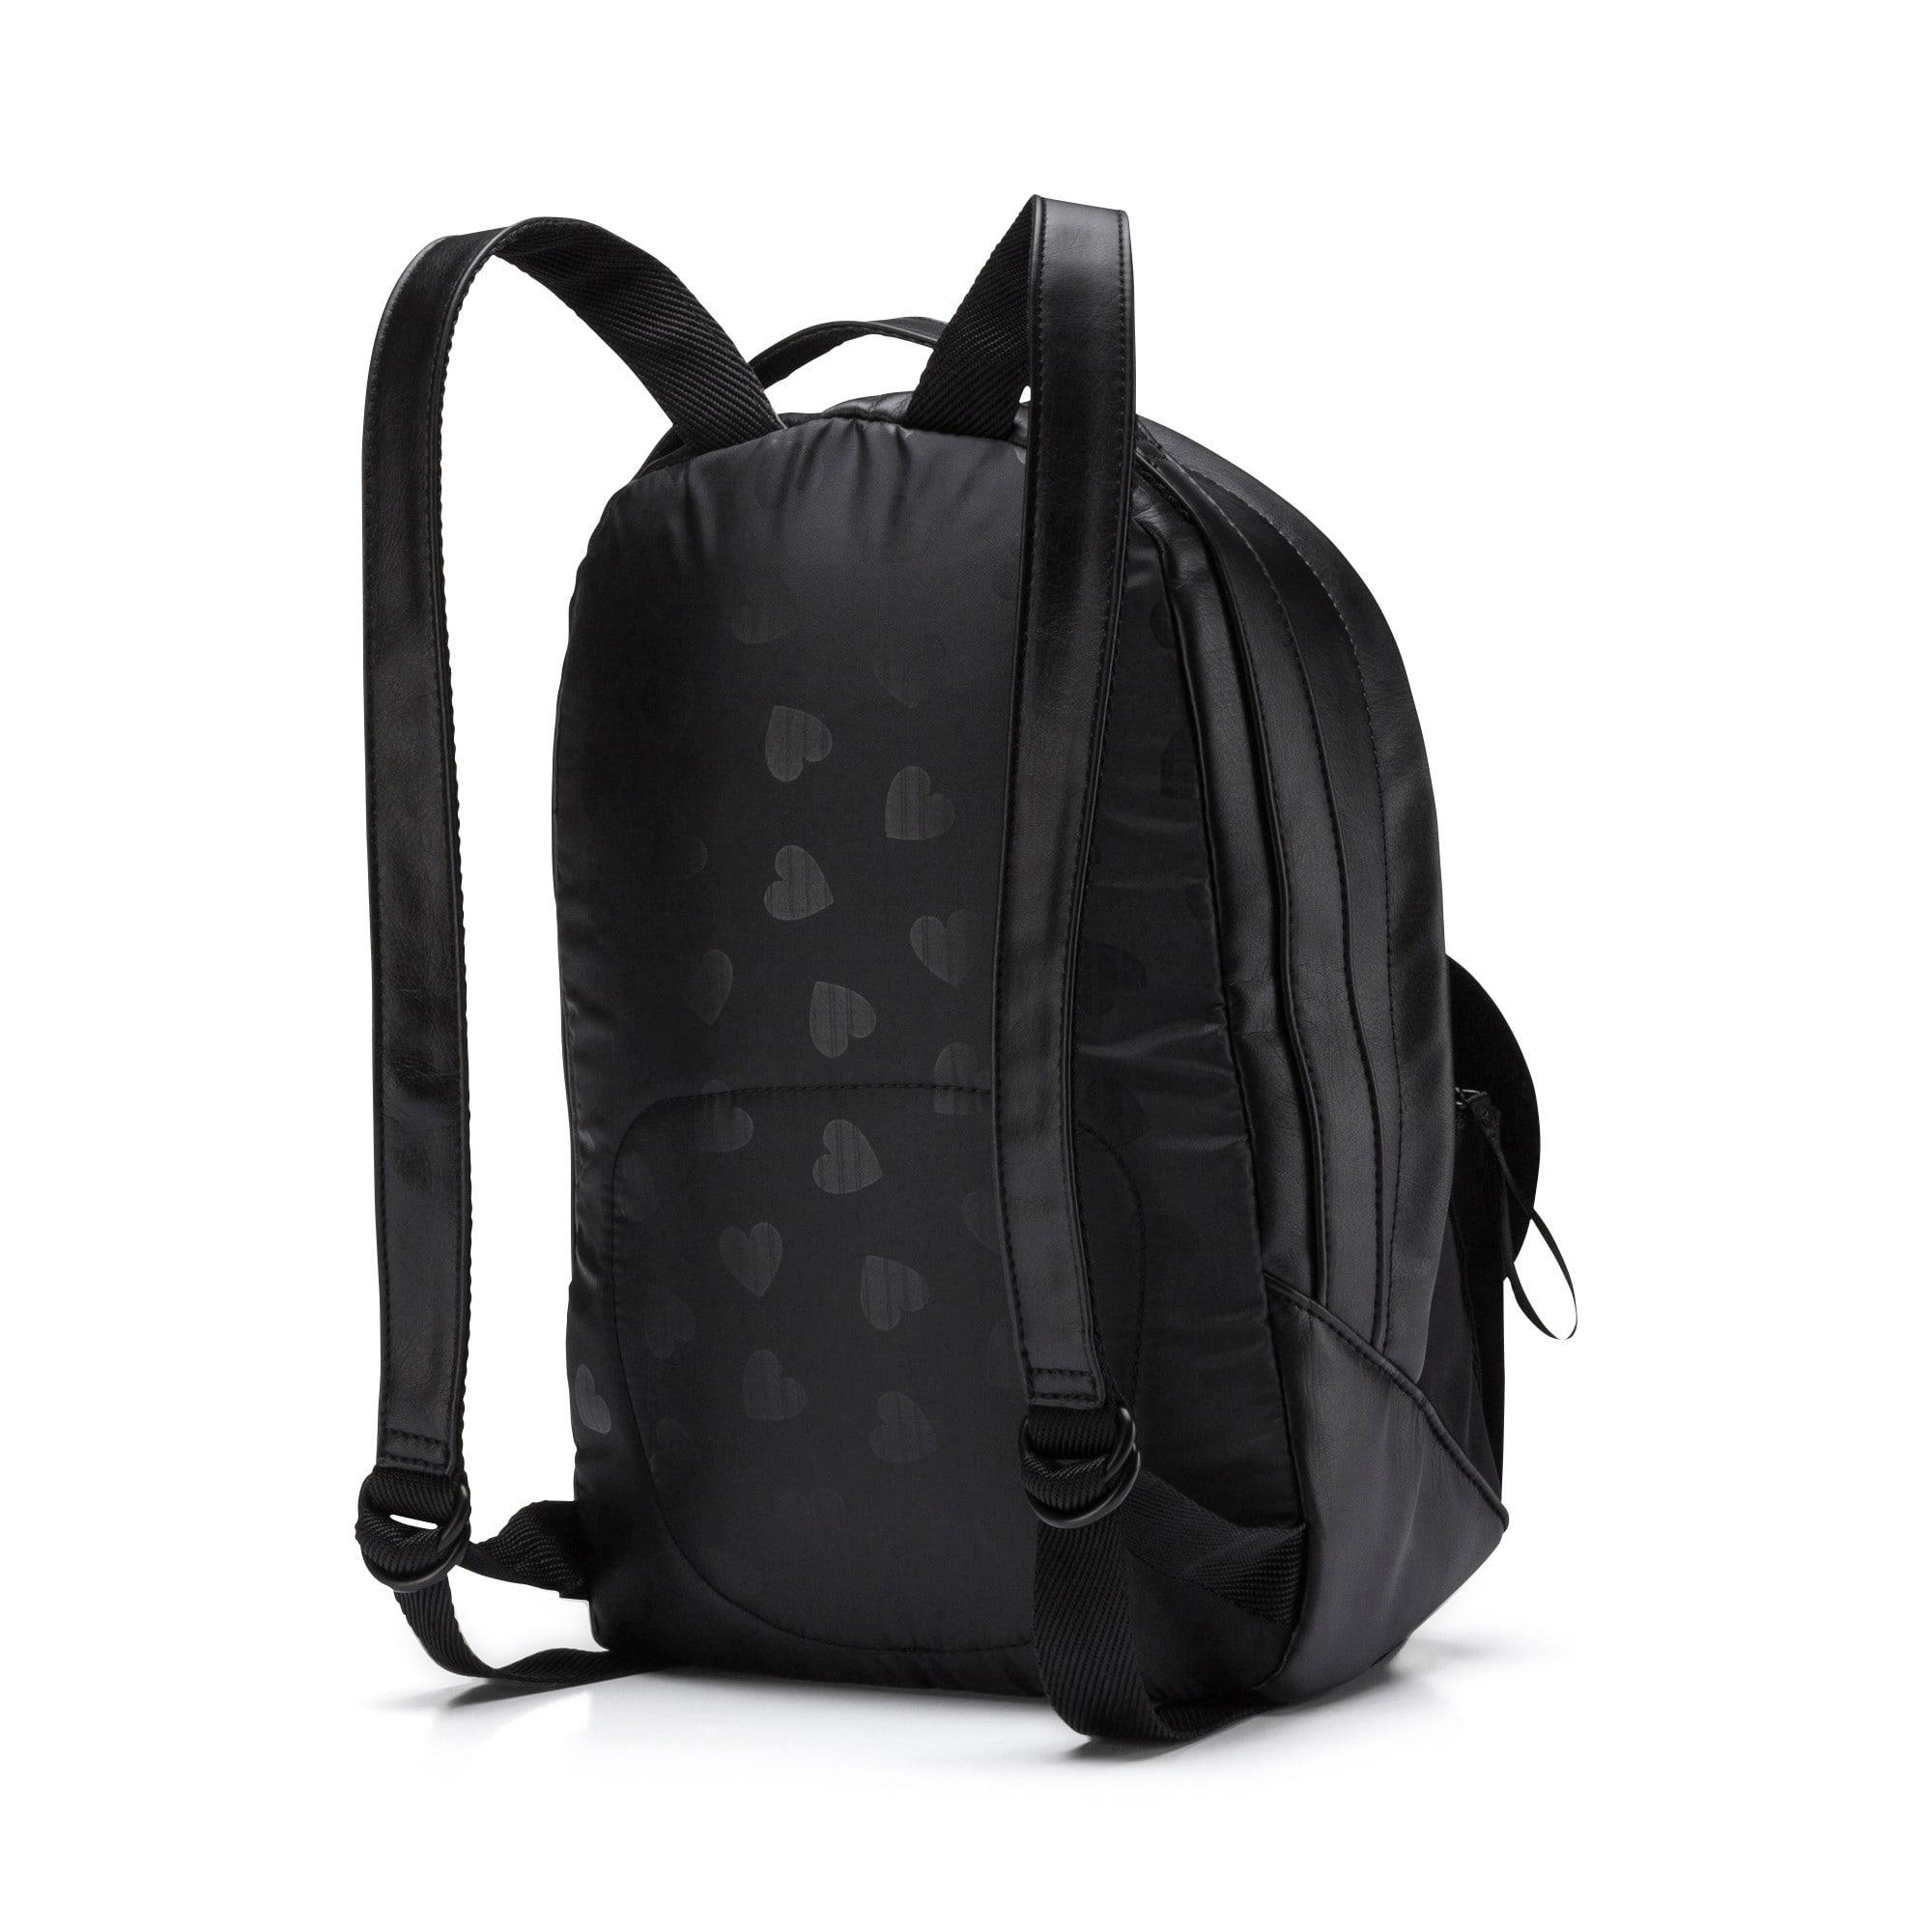 Thumbnail 3 of Prime Archive Valentine Backpack, Puma Black, medium